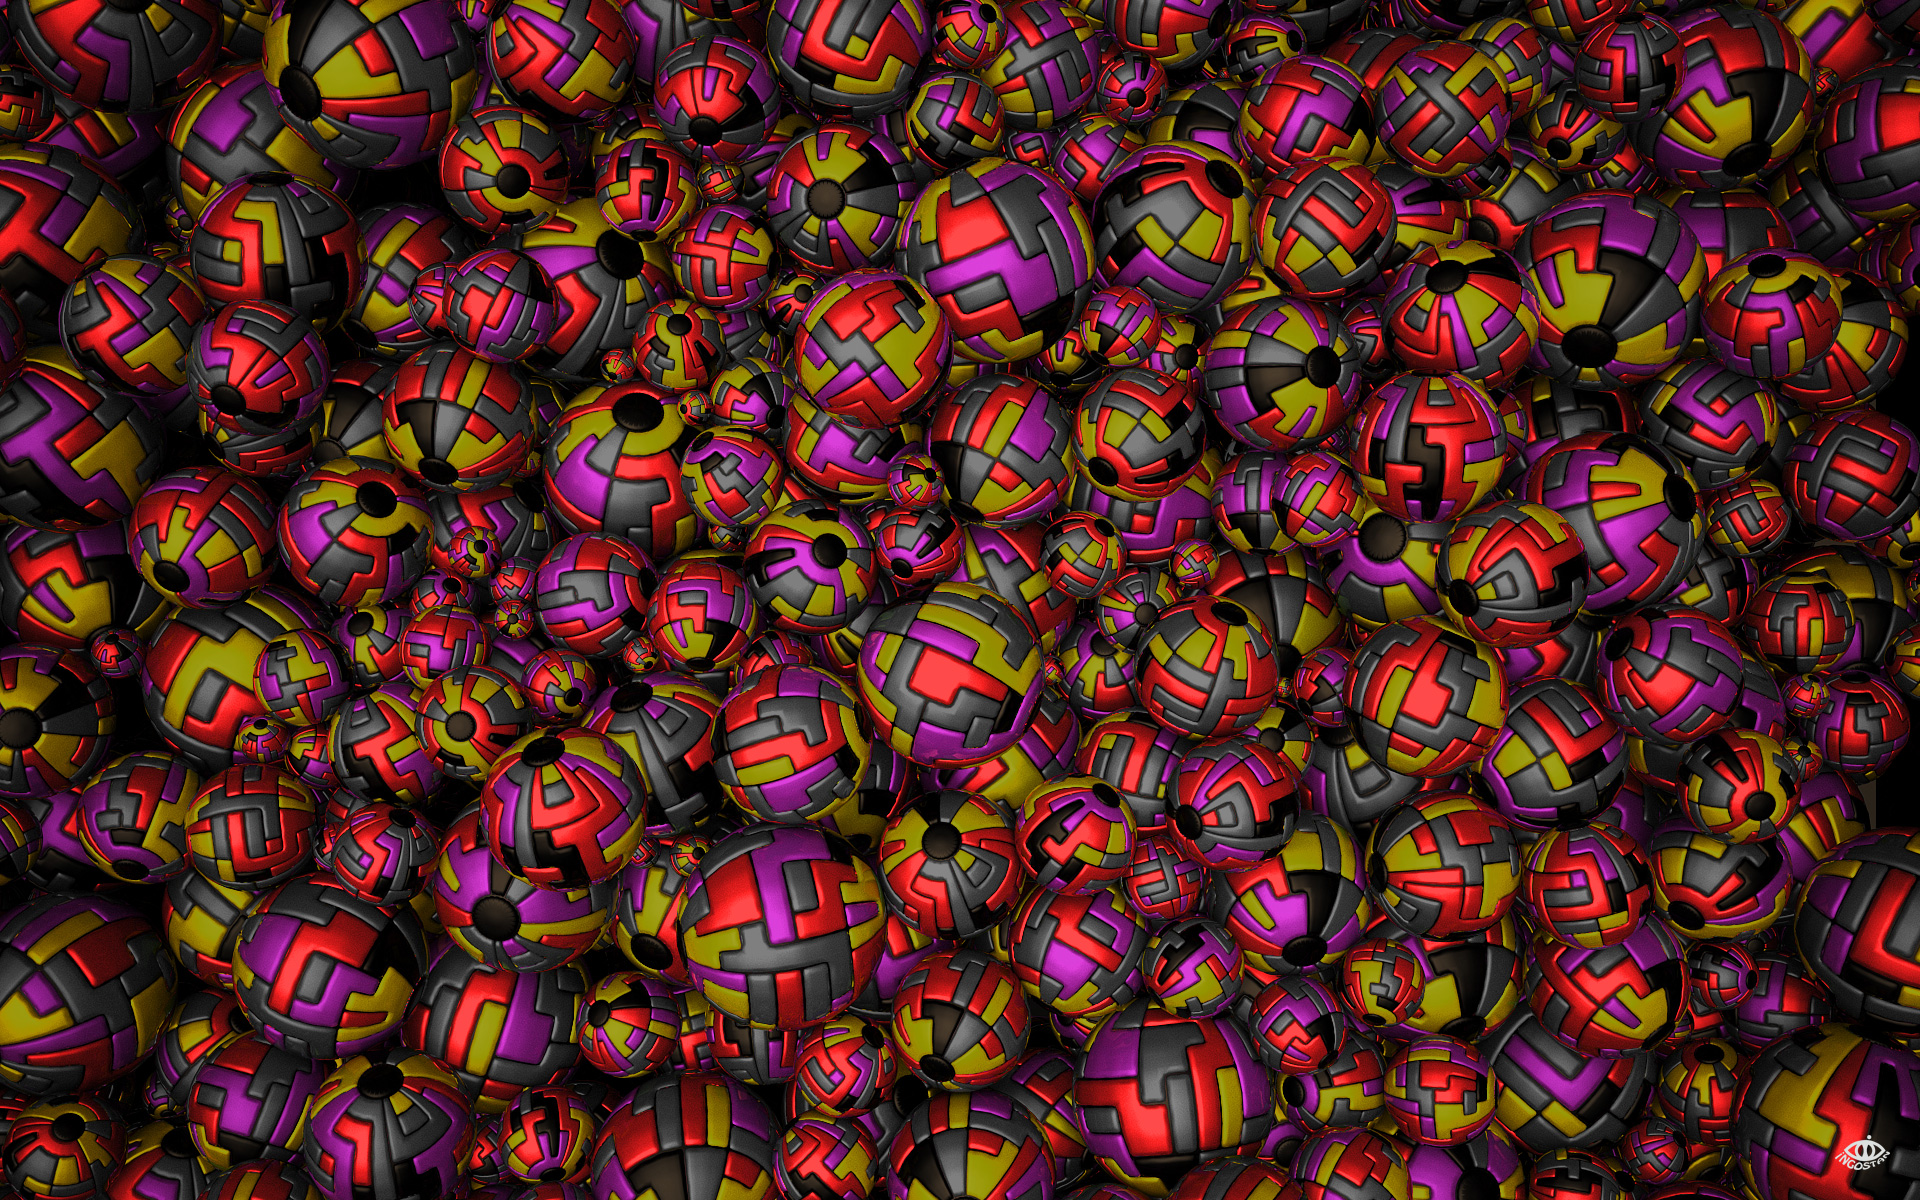 Eyeburning Spheres 1 by Ingostan